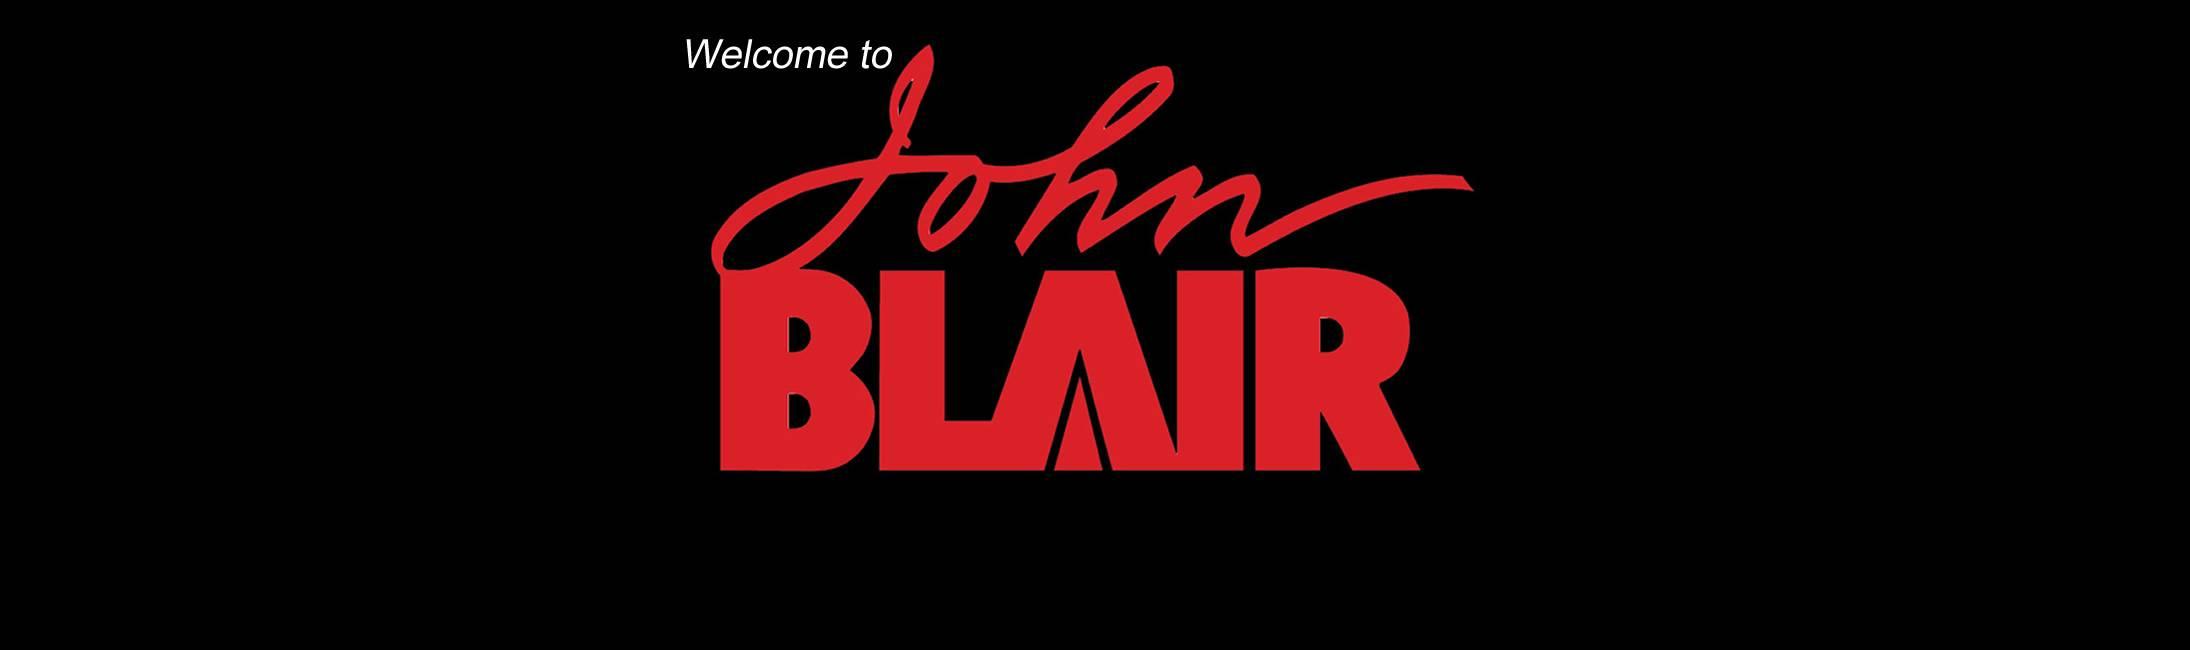 John Blair Banner Example